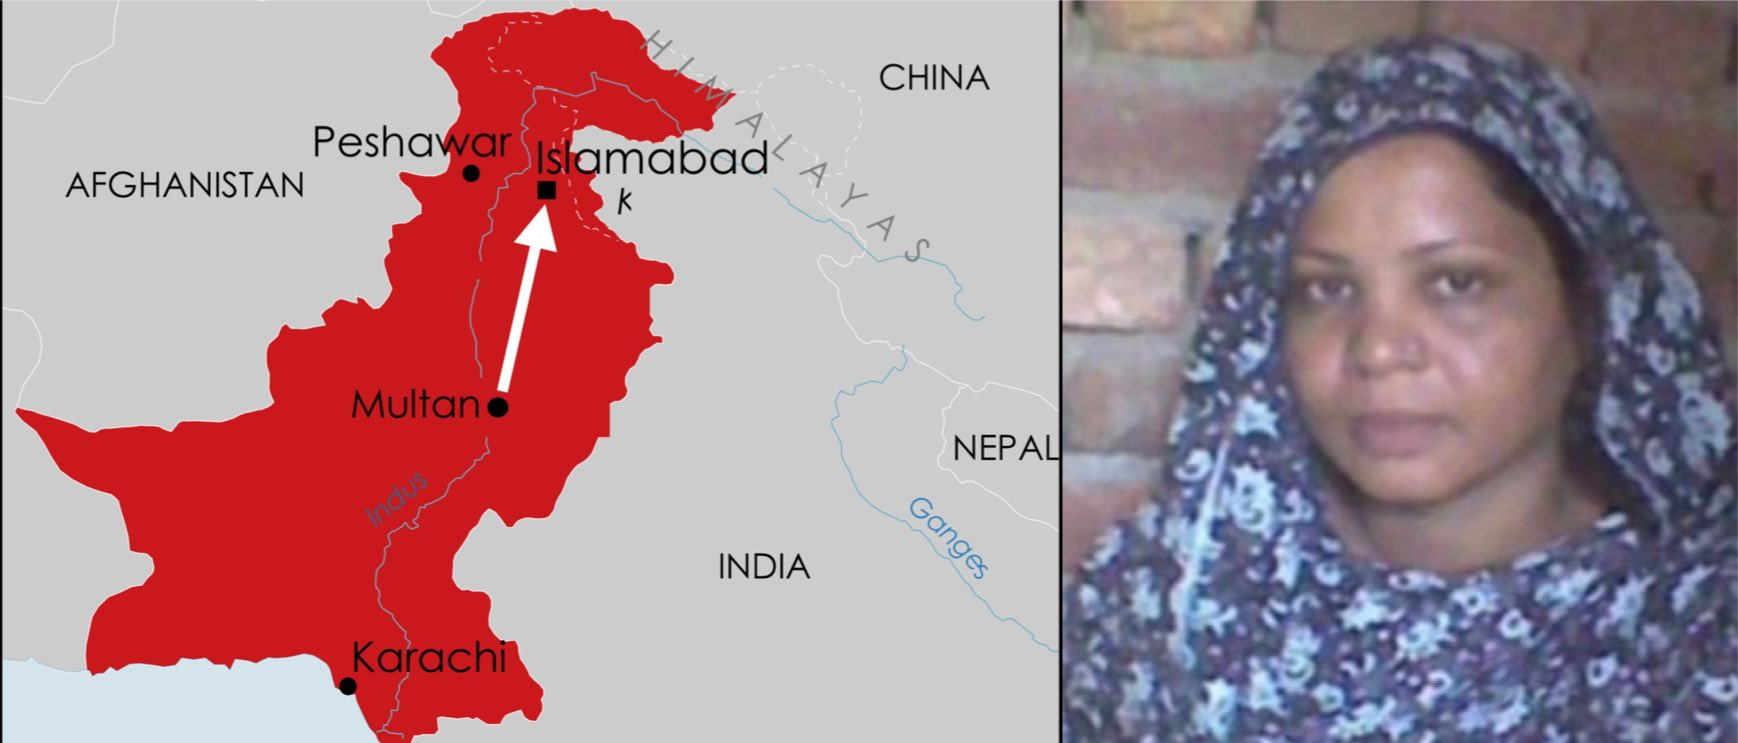 Multan Map:Asia Bibi